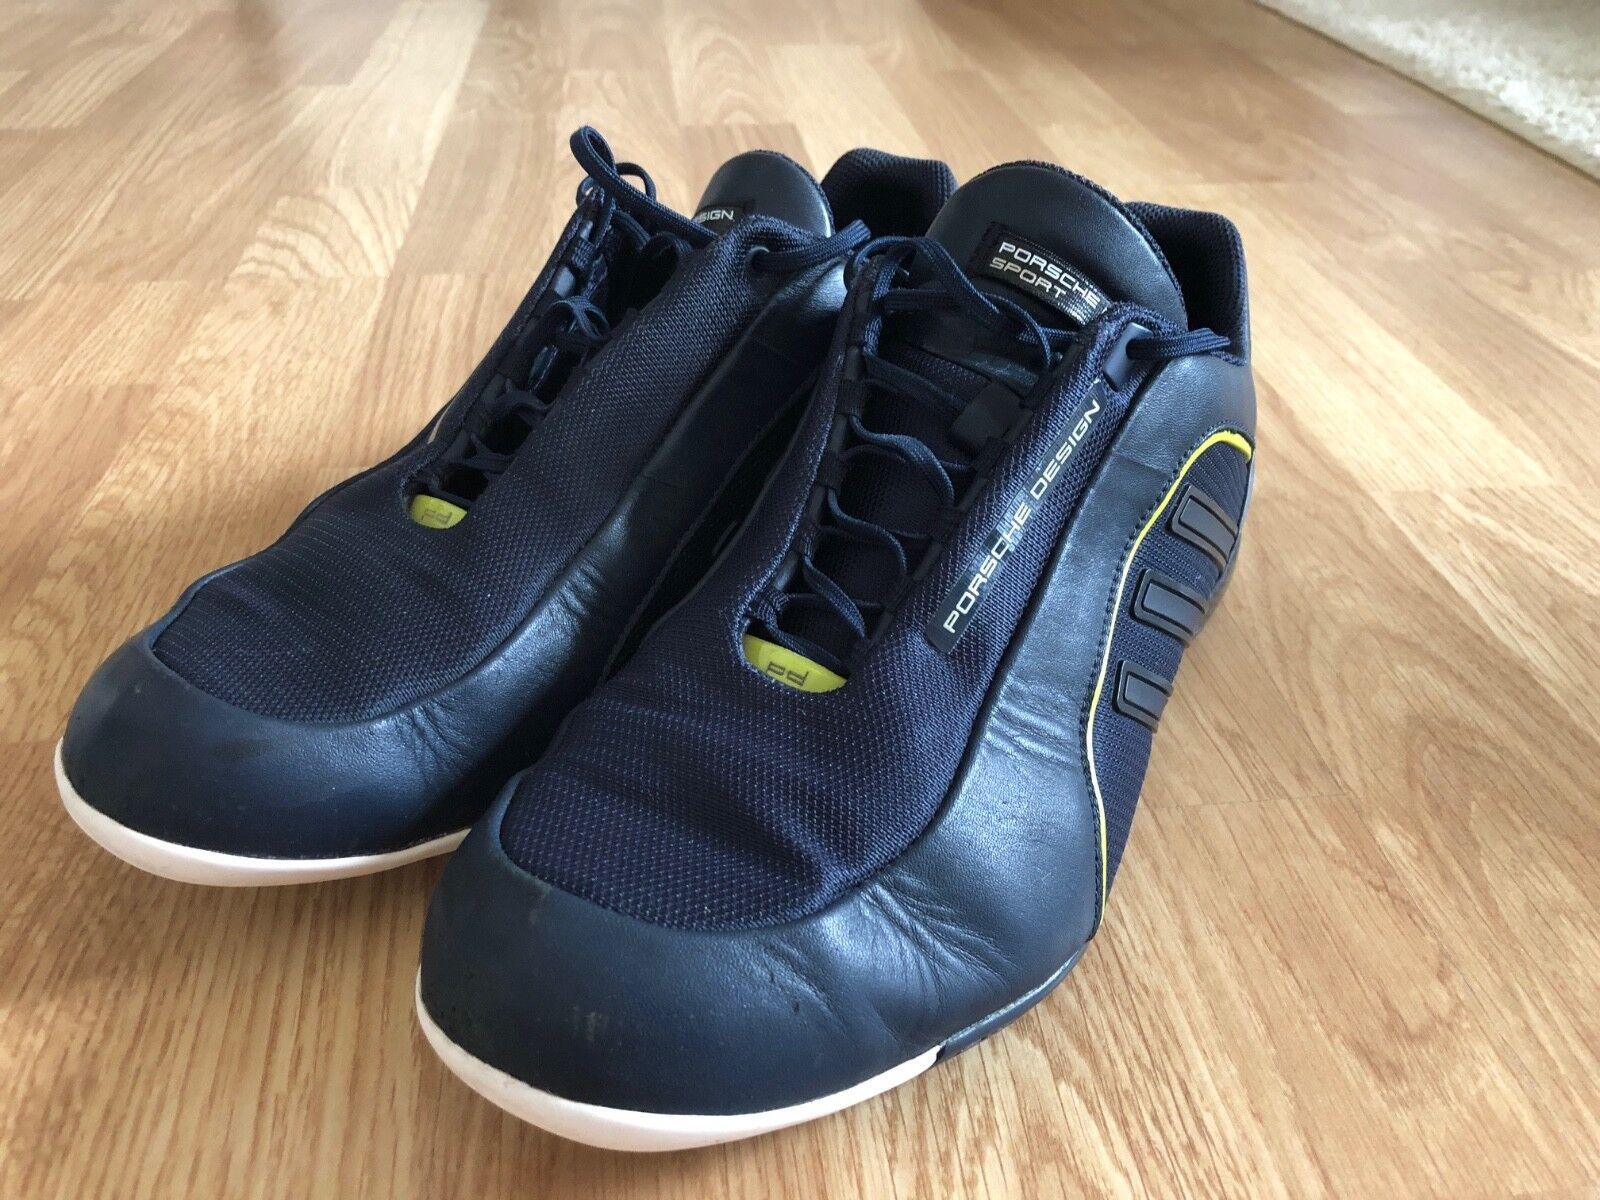 Porsche Design Adidas Schuhe dunkelblau dunkelblau dunkelblau Größe 40,5 c42daa